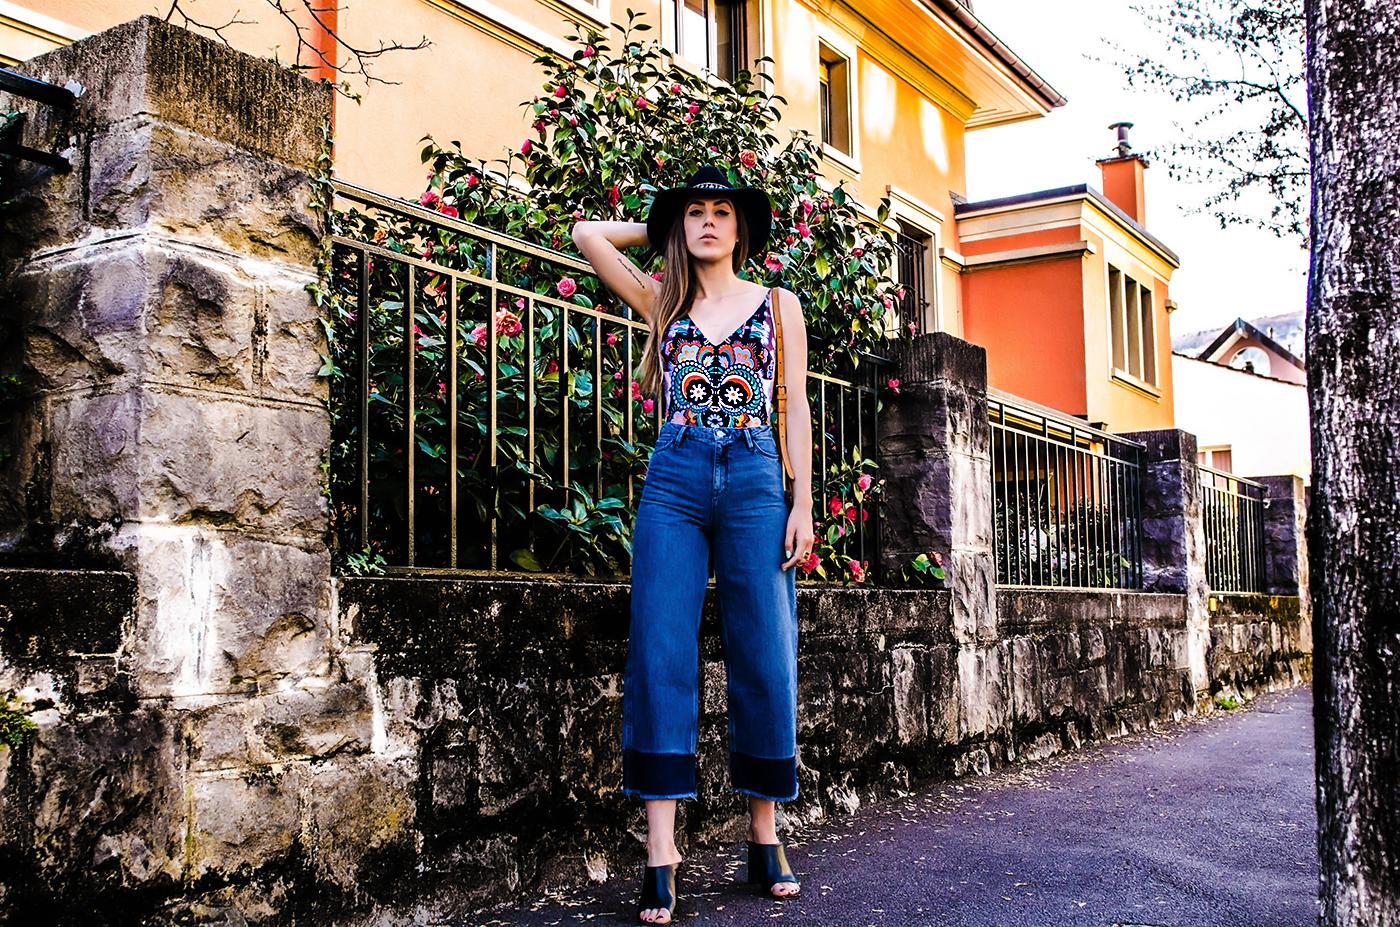 alison liaudat, blog from switzerland, swiss fashion blogger, blog mode suisse, swiss blog, beauty blogger swiss, denim culotte, trend spring 2015, denim, H&M trend collection,